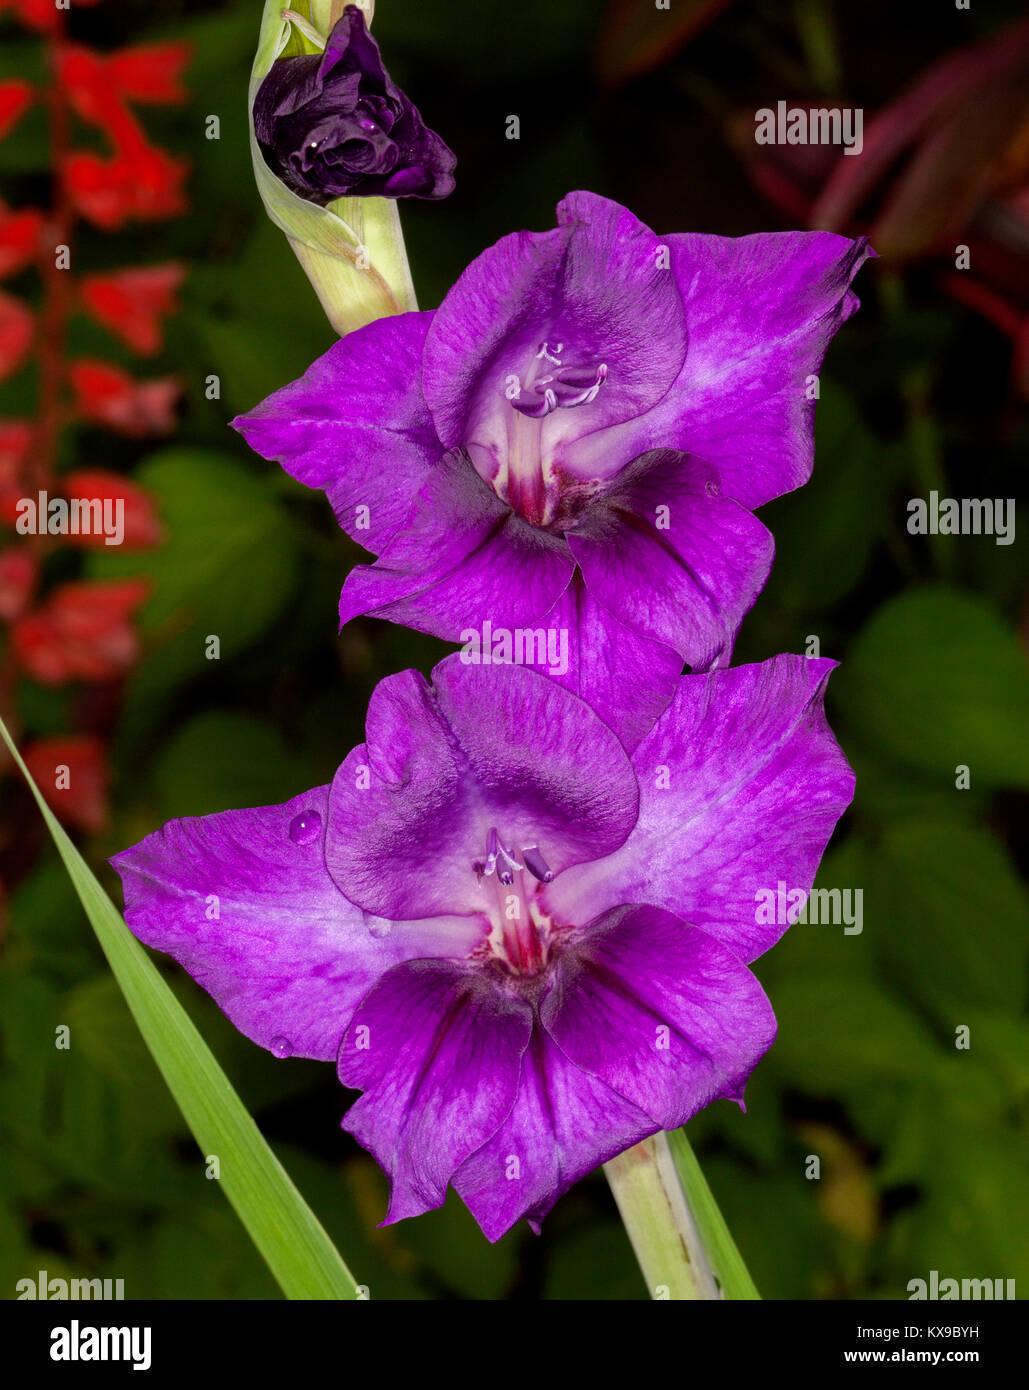 Stunning Vivid Deep Purple Flowers Of Gladiolus A Flowering Bulb